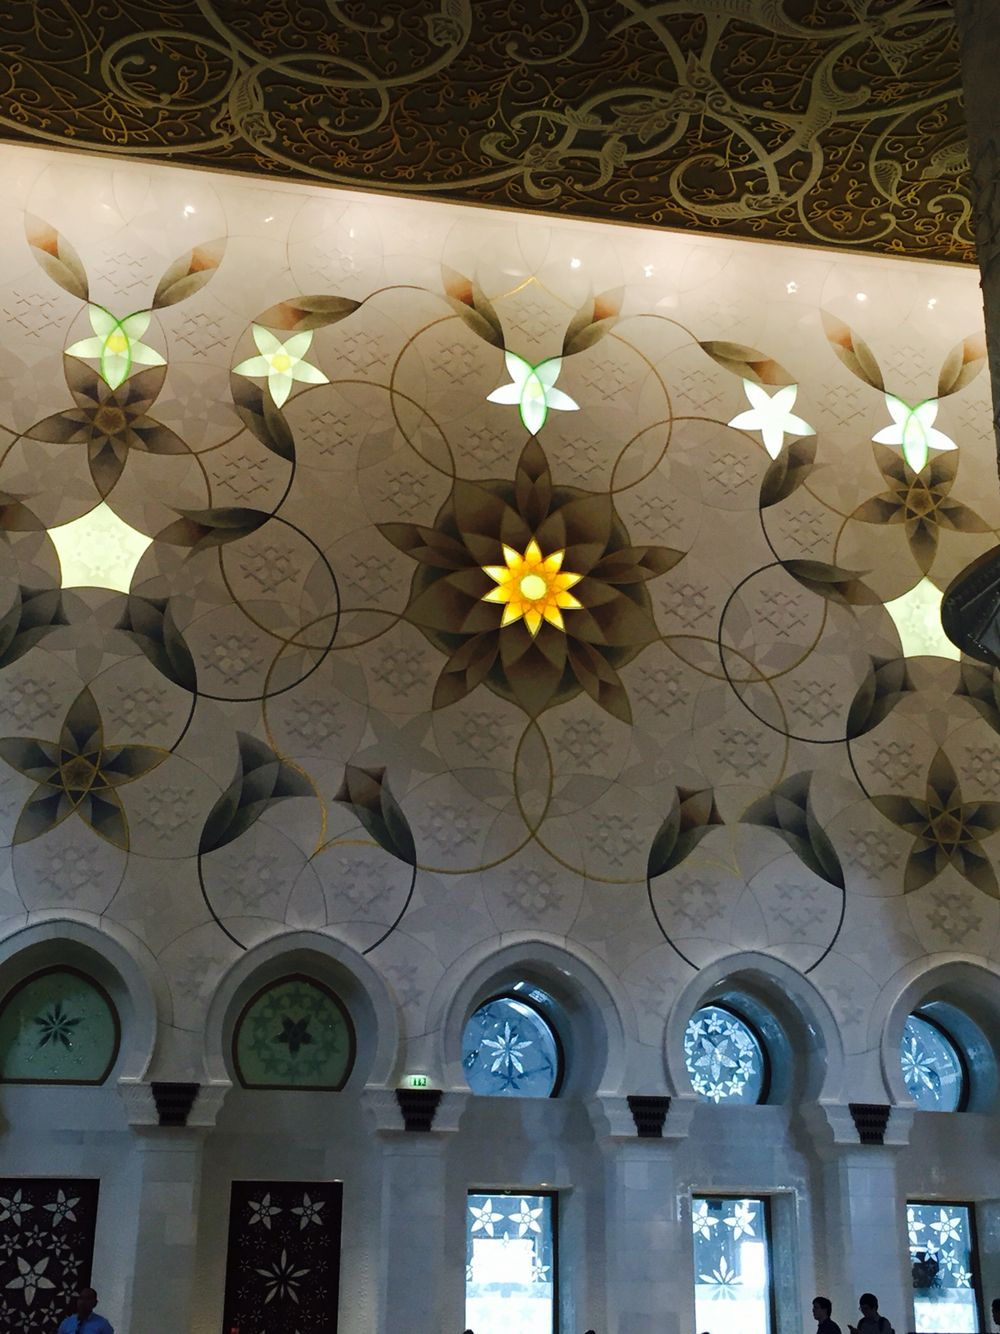 Sheikh Zayed Grand Mosque Walls Sheikh Zayed Grand Mosque Grand Mosque Mosque